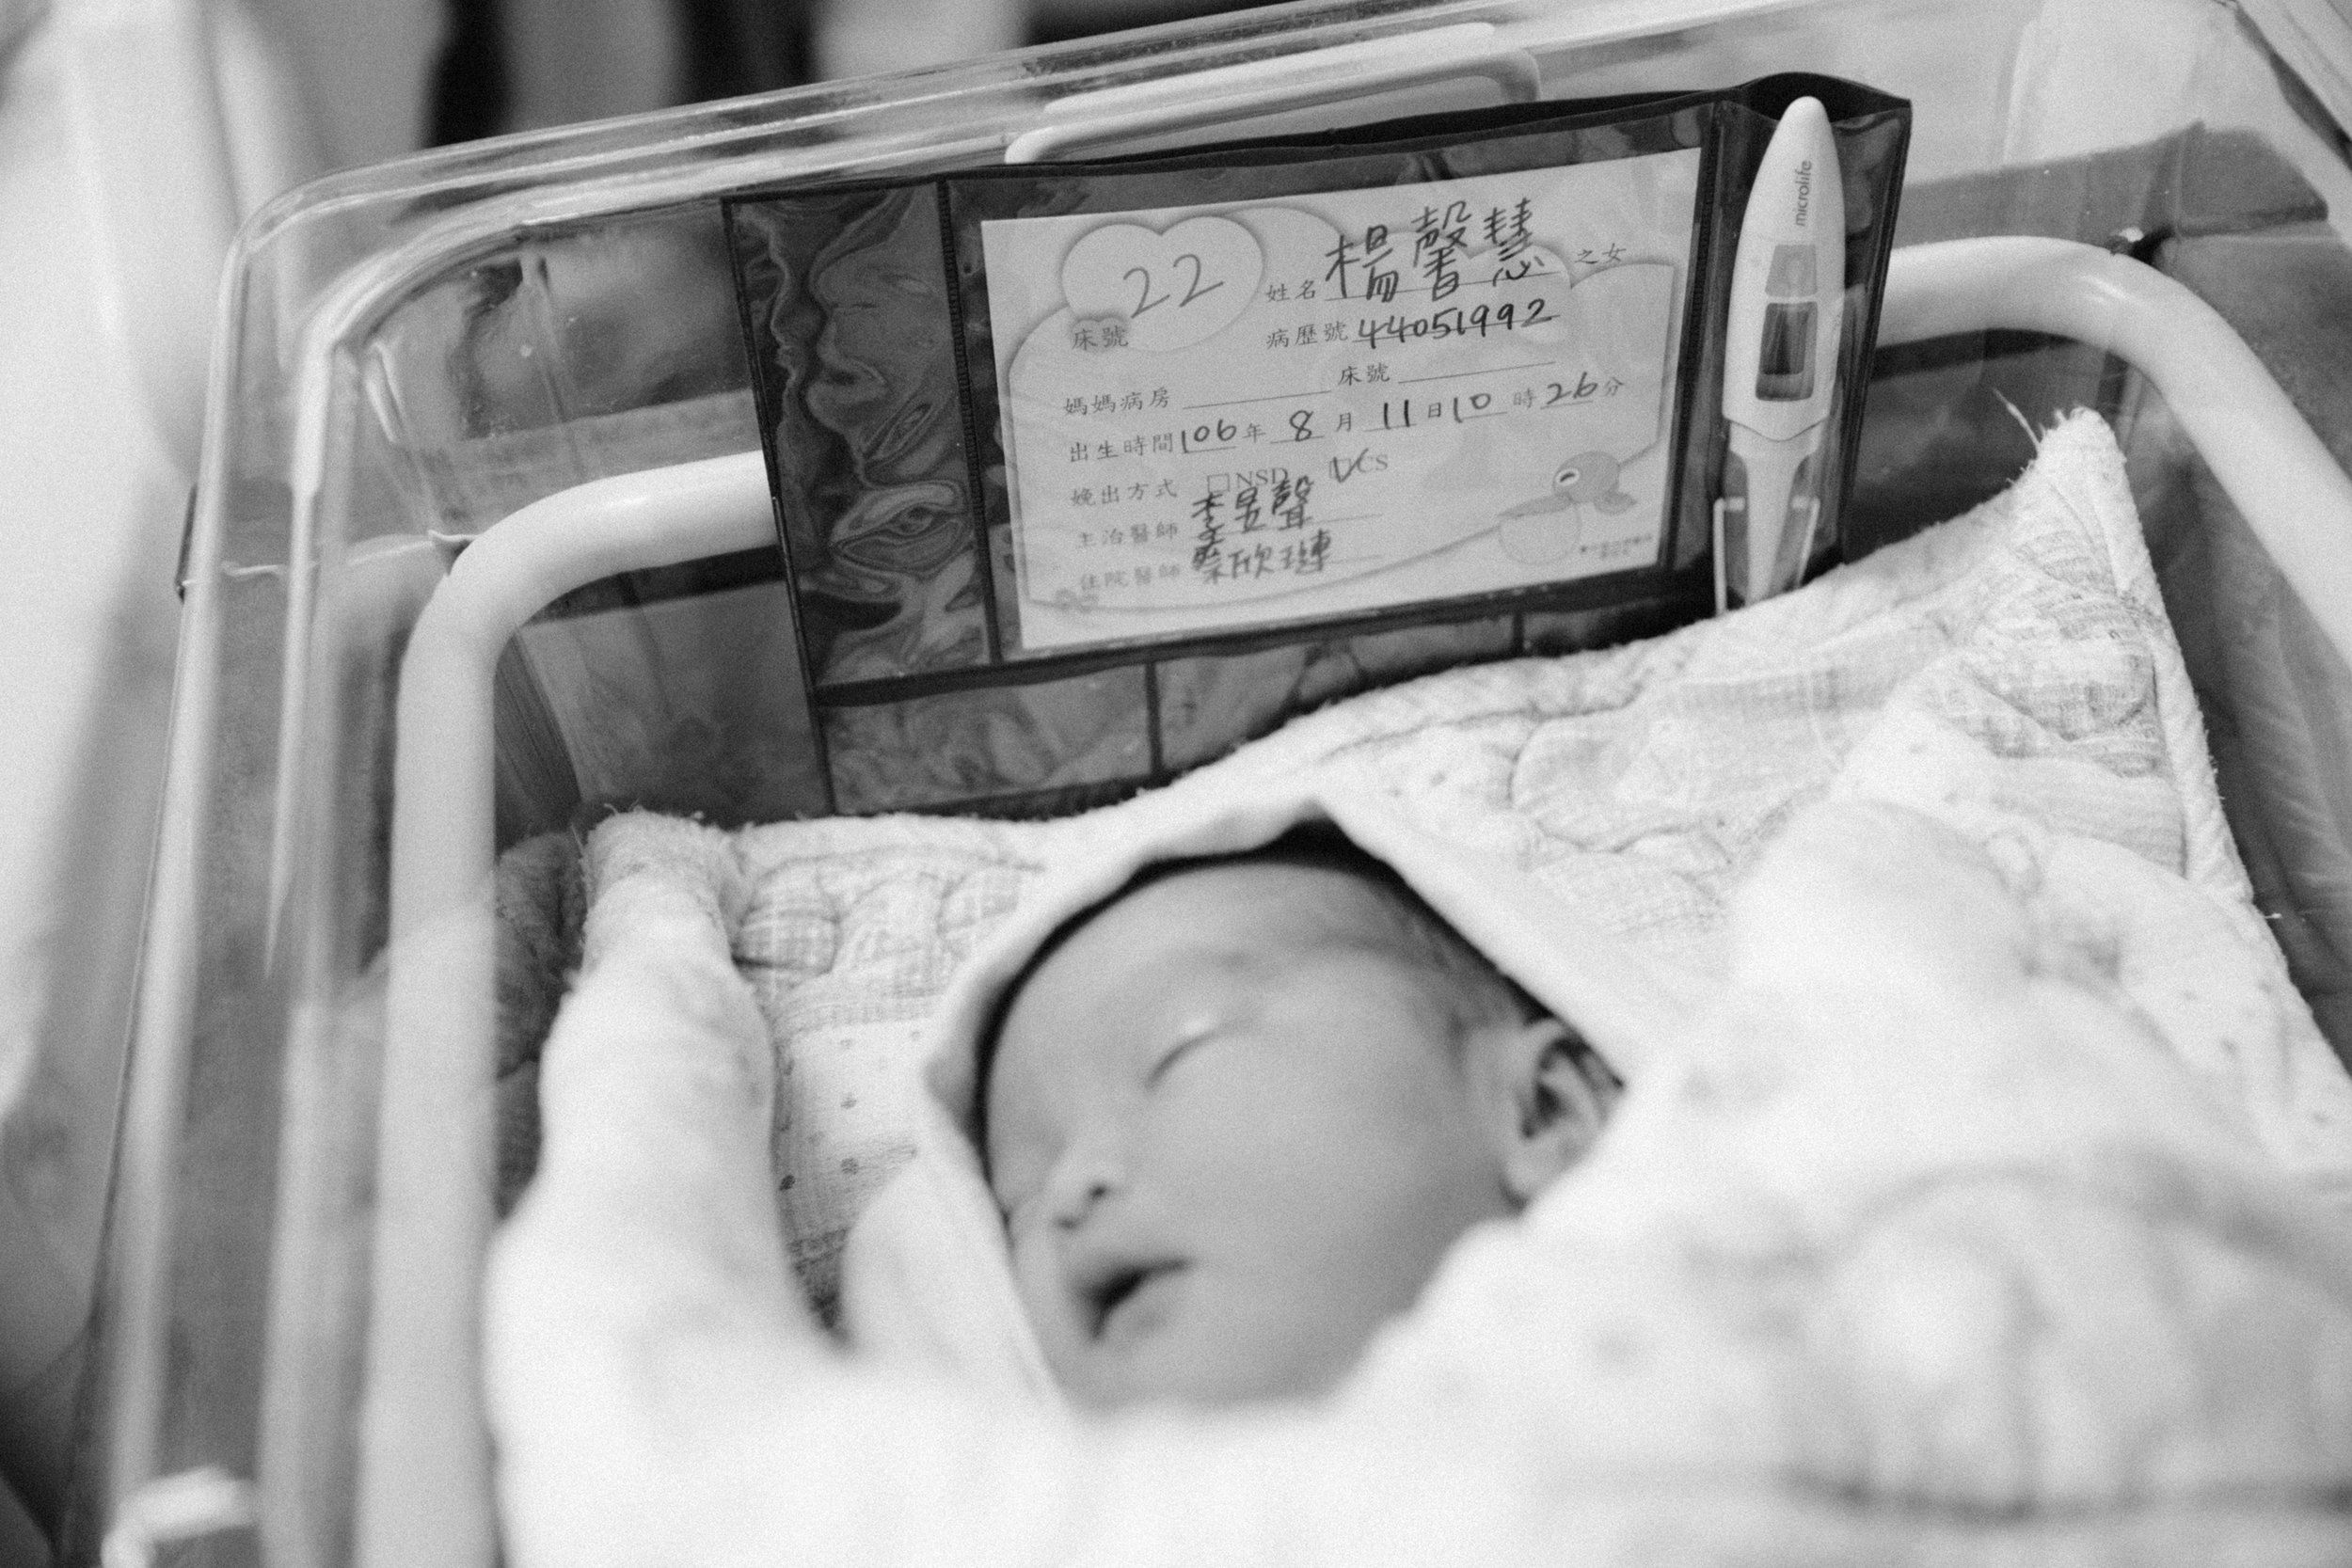 star-ken-firstday-newborn-baby-taipei-台北榮總-41.jpg